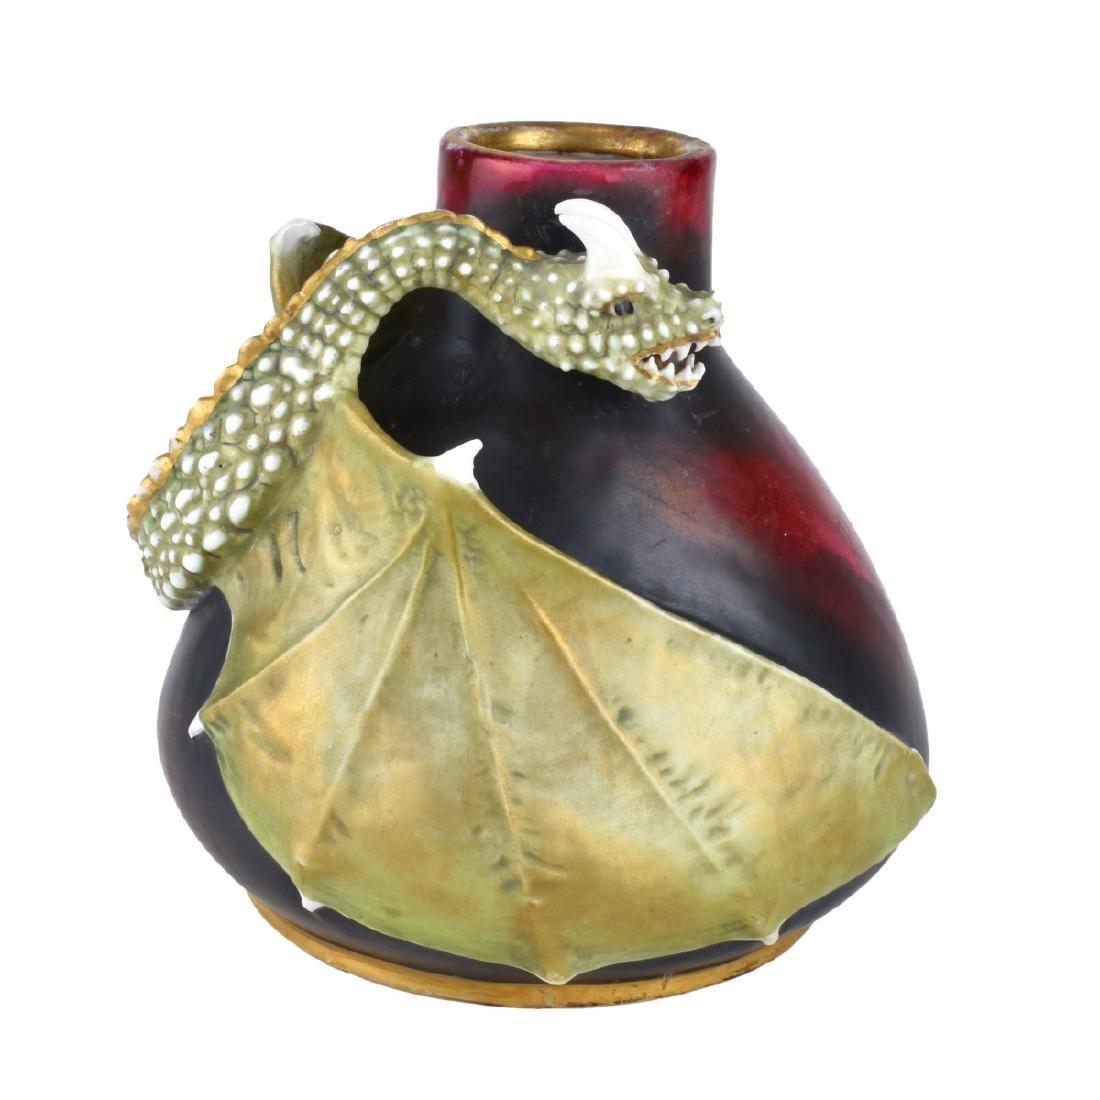 Turn Teplitz Amphora Dragon Vase